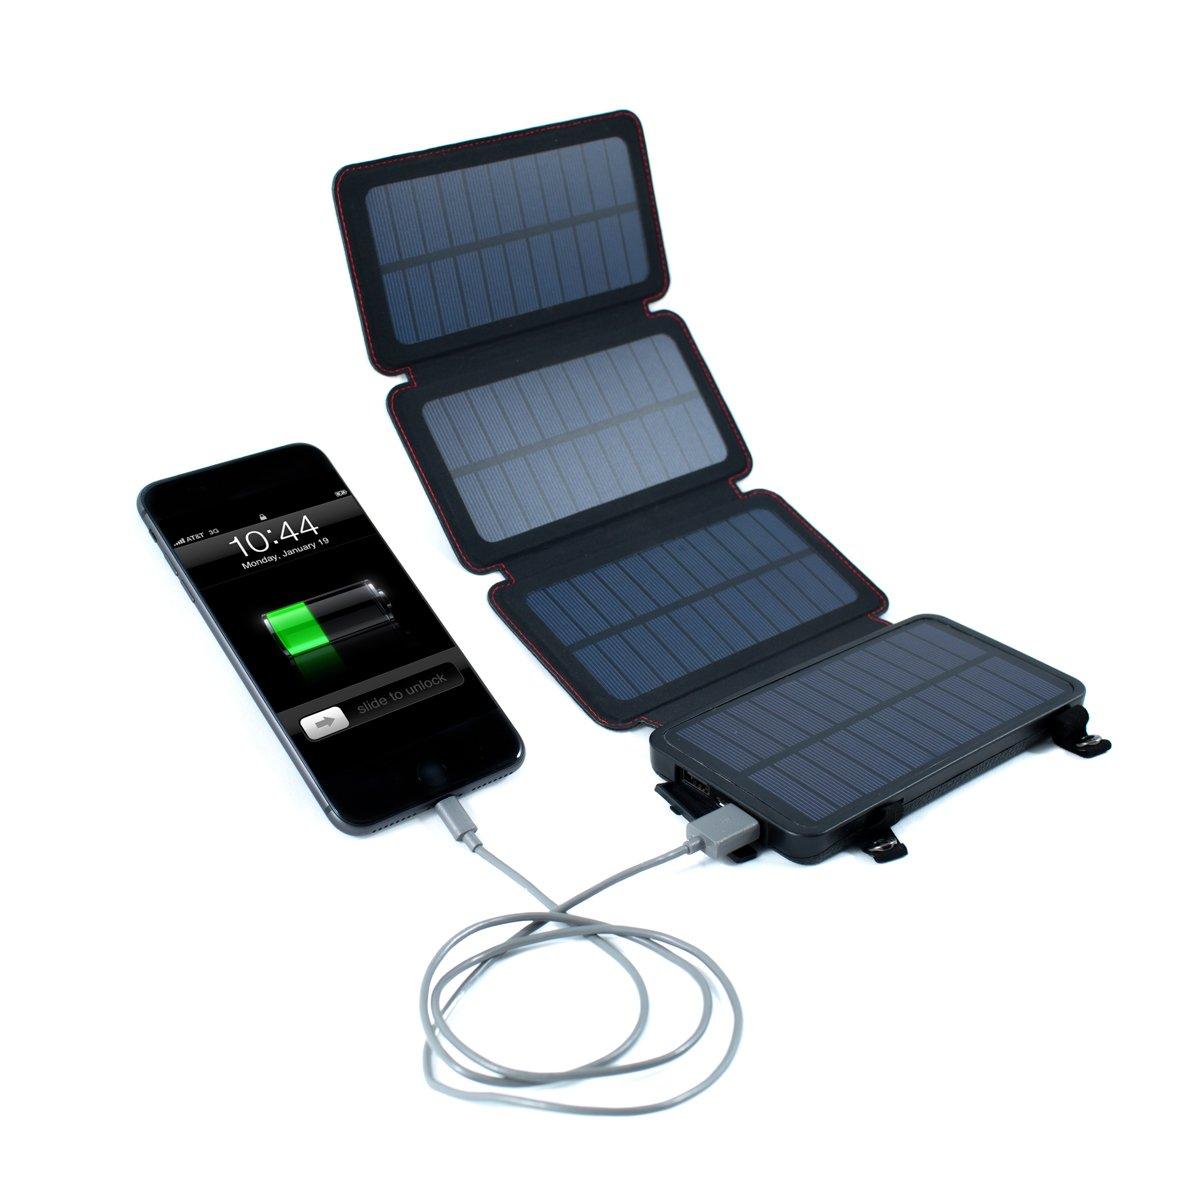 Quadrapro Solar Power Bank With Wireless Dual Usb Charging By Frog Co Solar Energy Panels Solar Panels Portable Solar Power